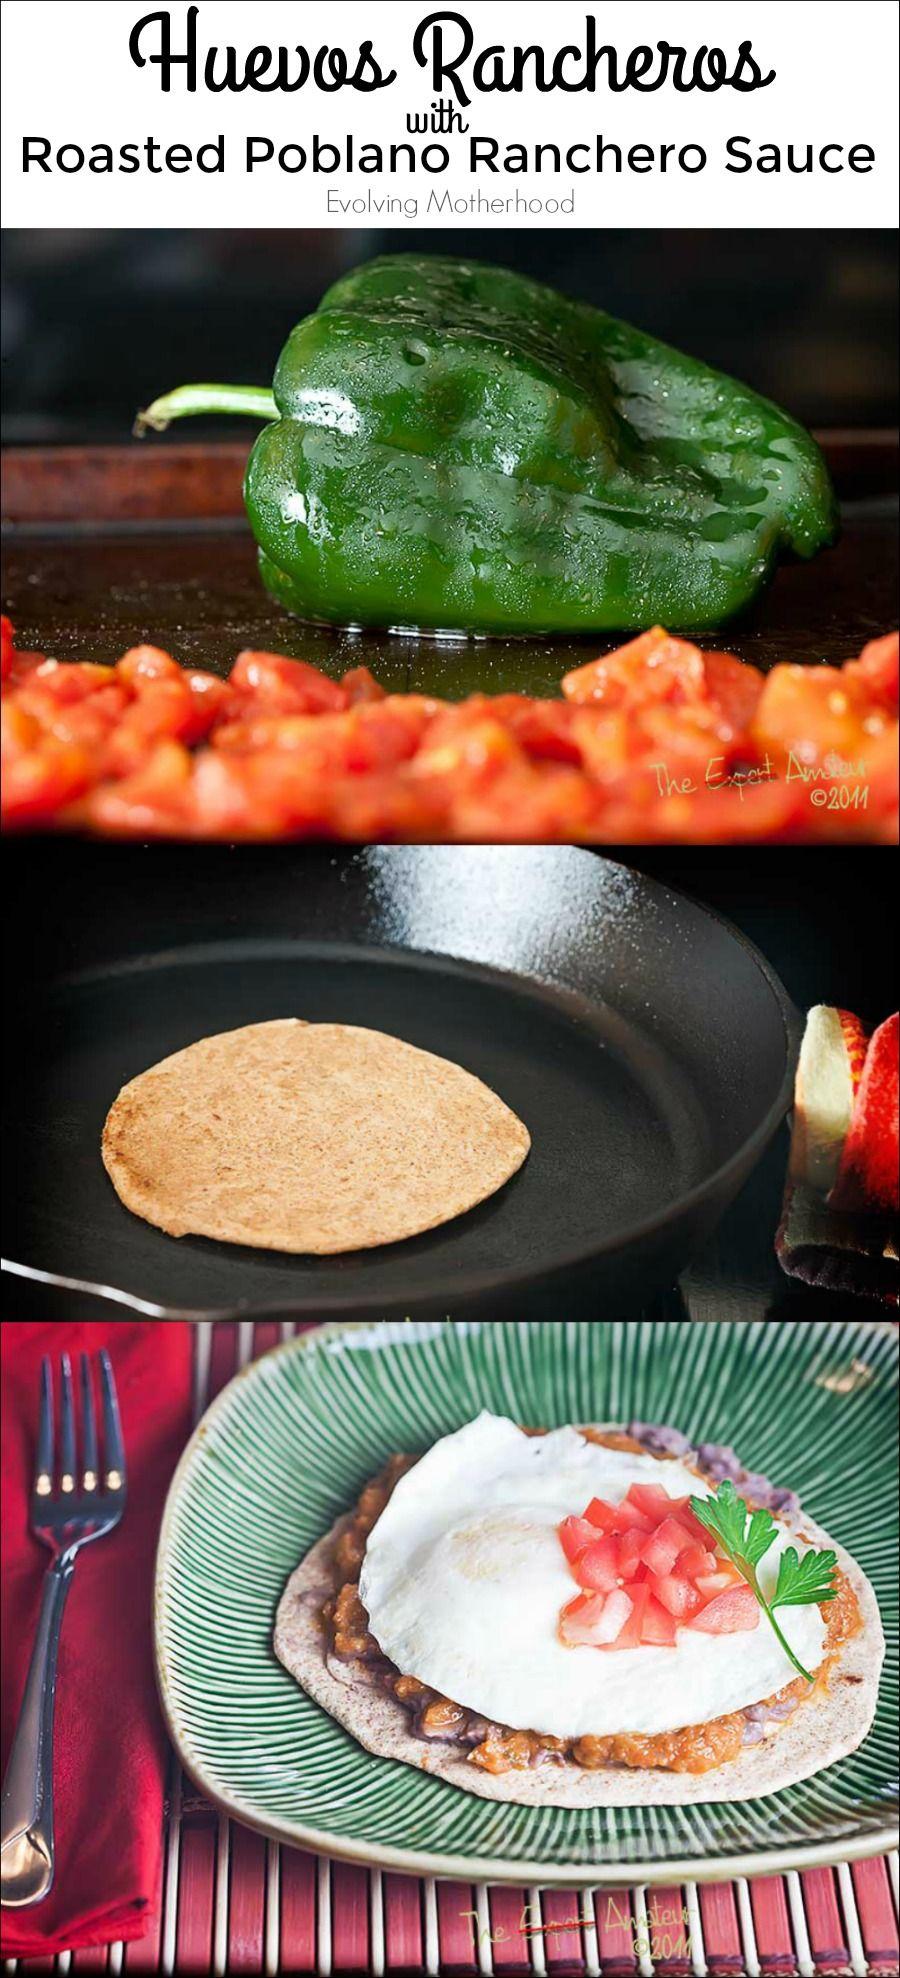 Huevos Rancheros with roasted poblano ranchero sauce